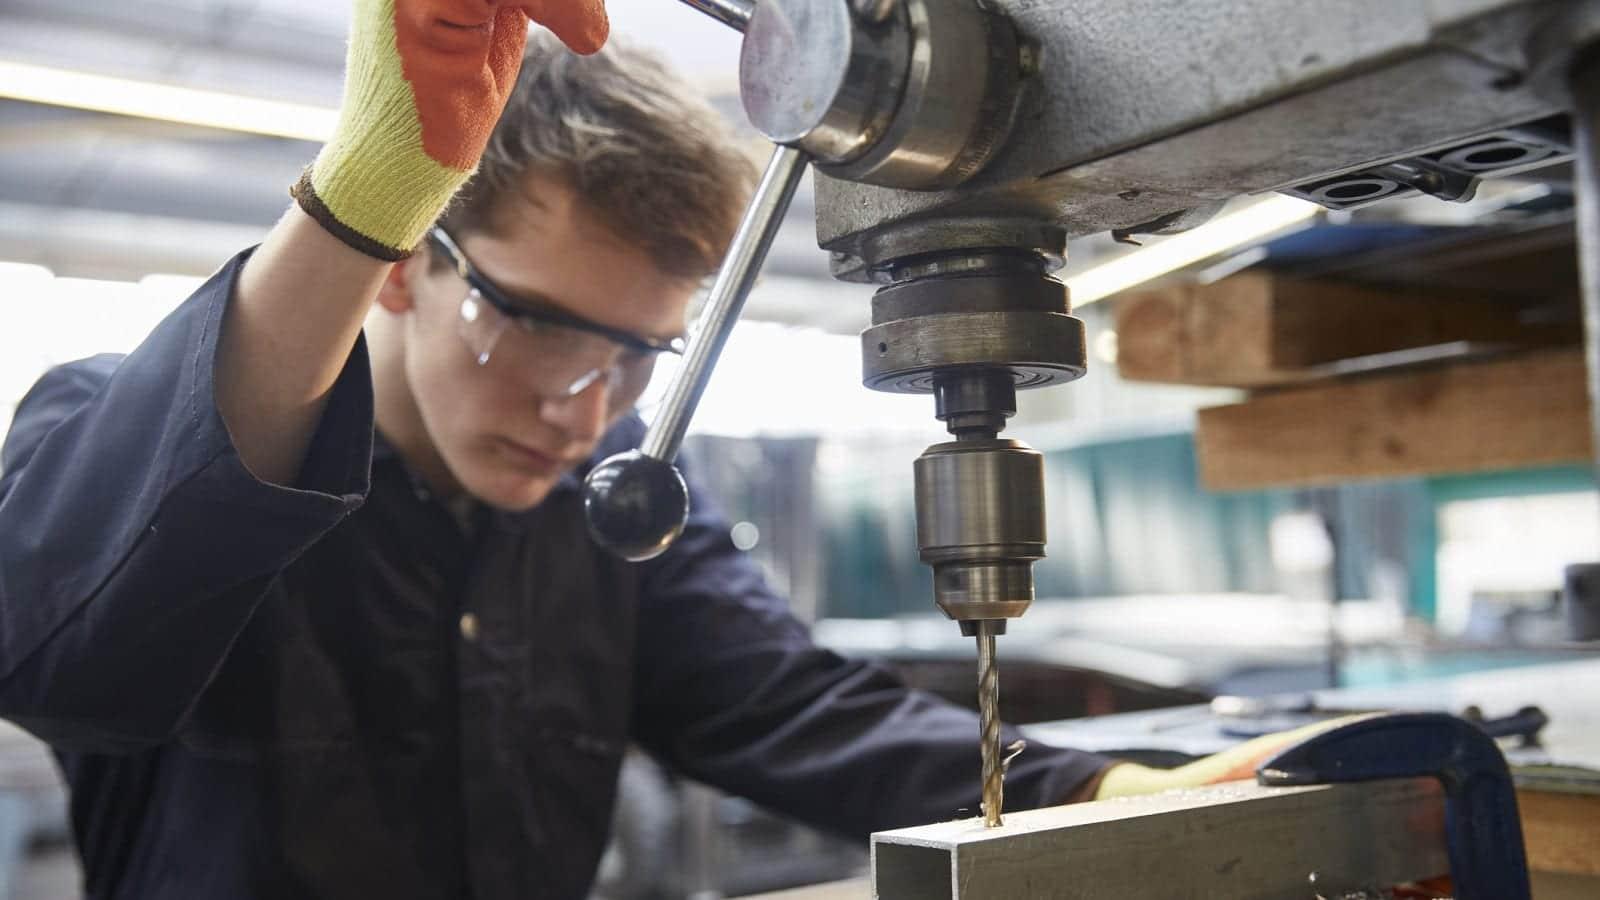 Welder Wearing Protective Eyeglasses Working With Metal